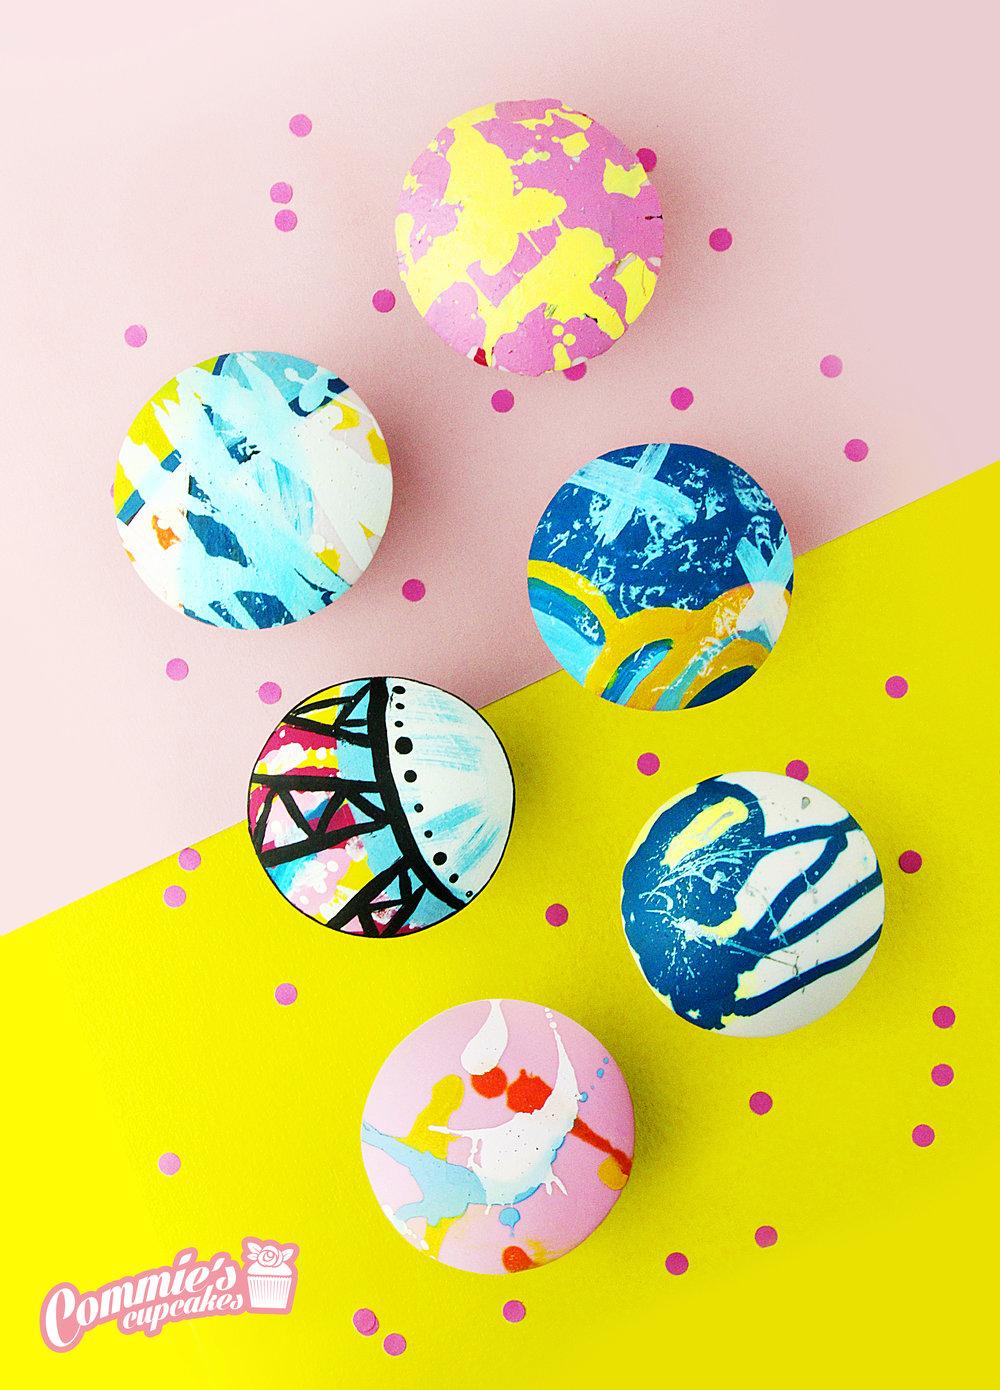 Commie's Cupcakes_Painted Cupcakes.jpg